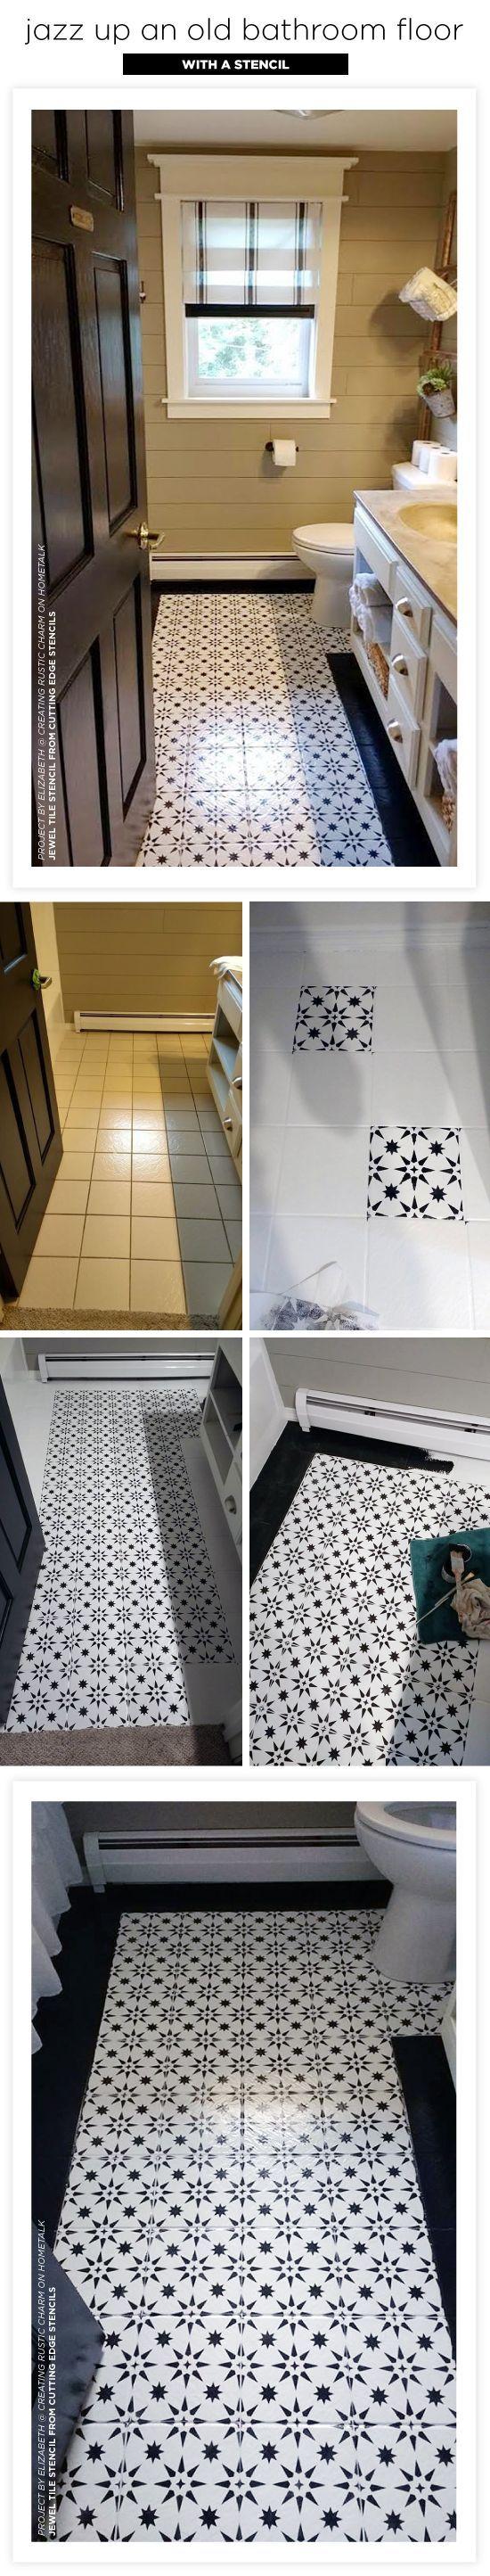 Jazz Up An Old Bathroom Floor Using Stencils Bathroom Tile Diy Floor Makeover Floor Stencils Diy